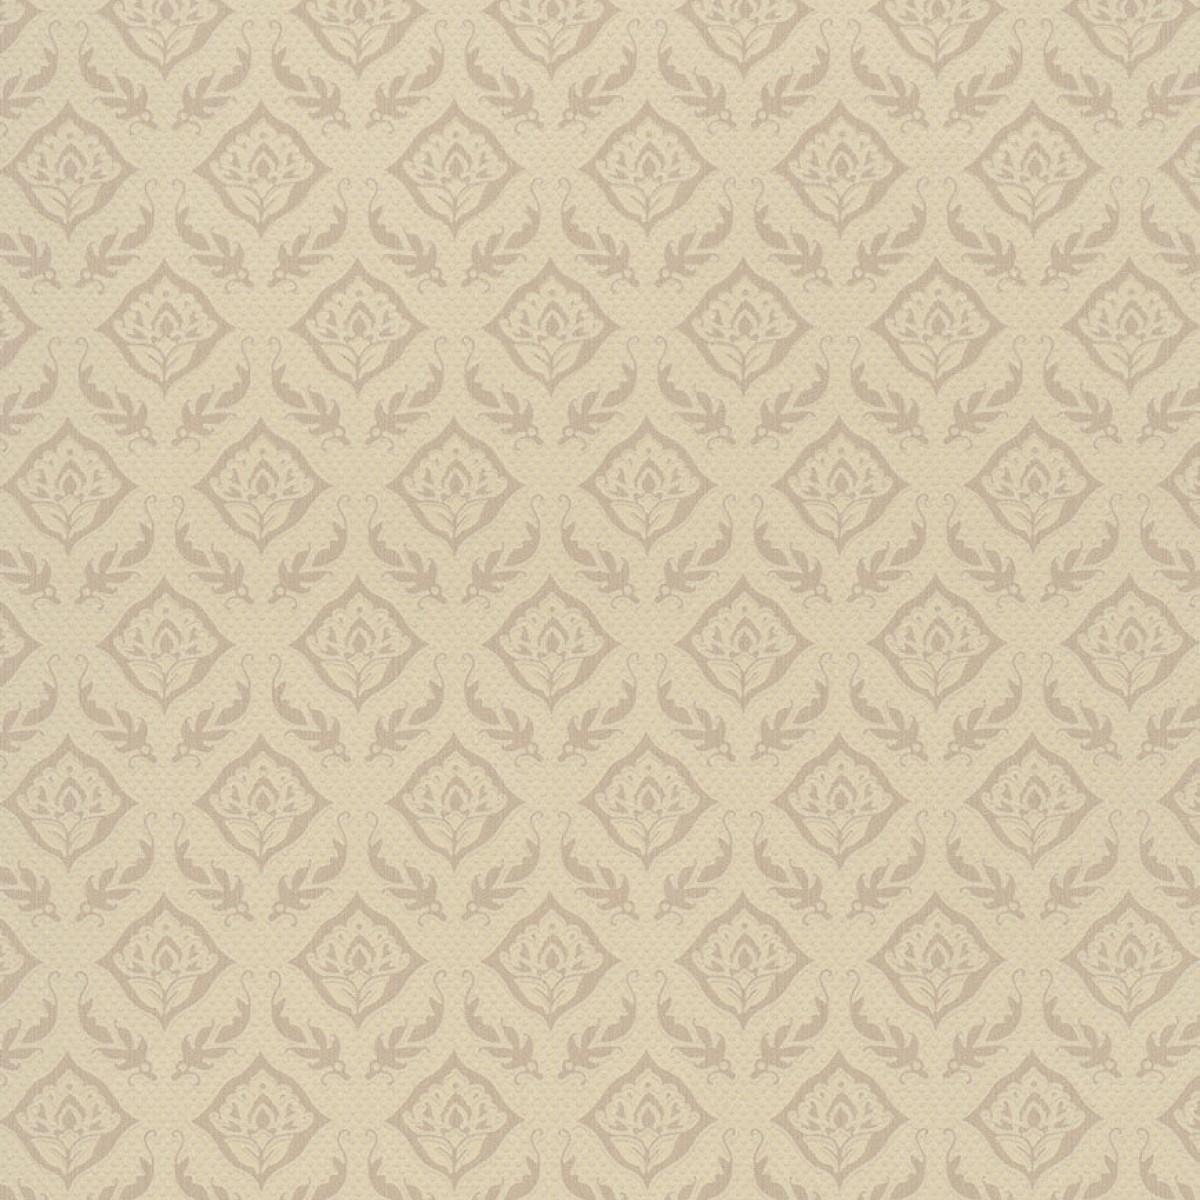 Tapet lavabil Chambord 361021, 5.2mp / rolă, Eijffinger